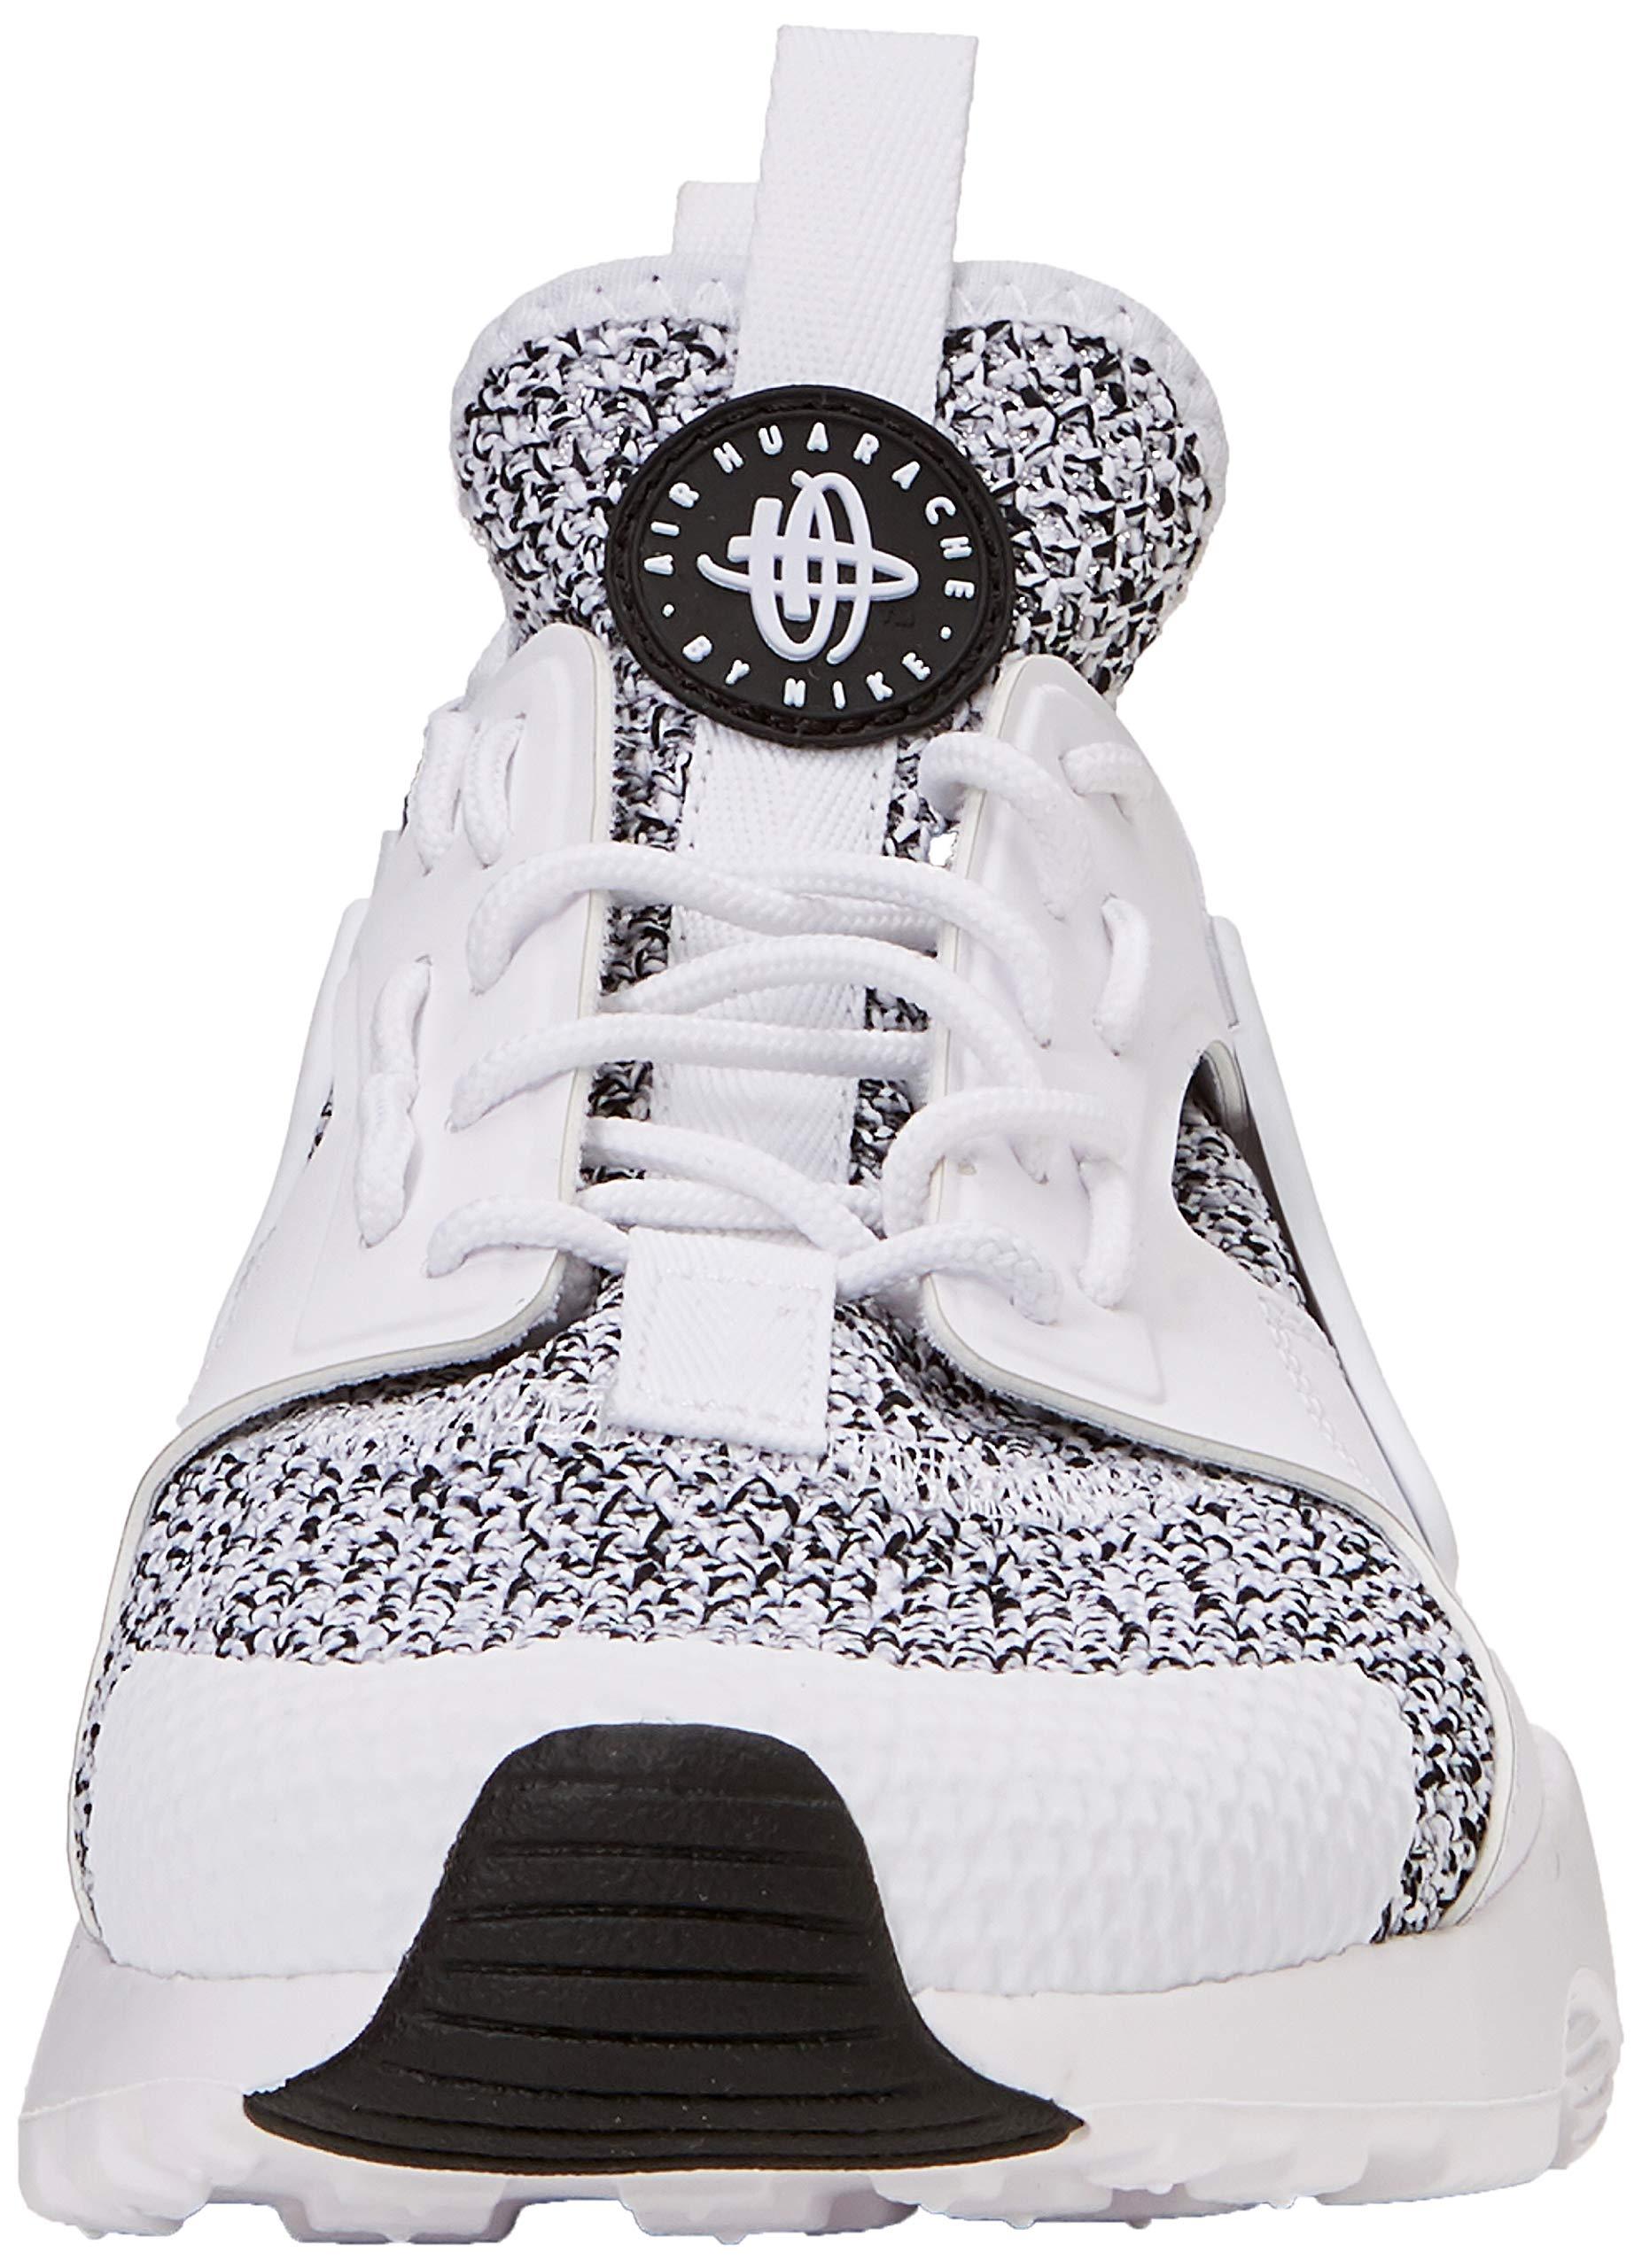 81cQNGtKJ8L - Nike Men's Air Huarache Run Ultra Se Gymnastics Shoes